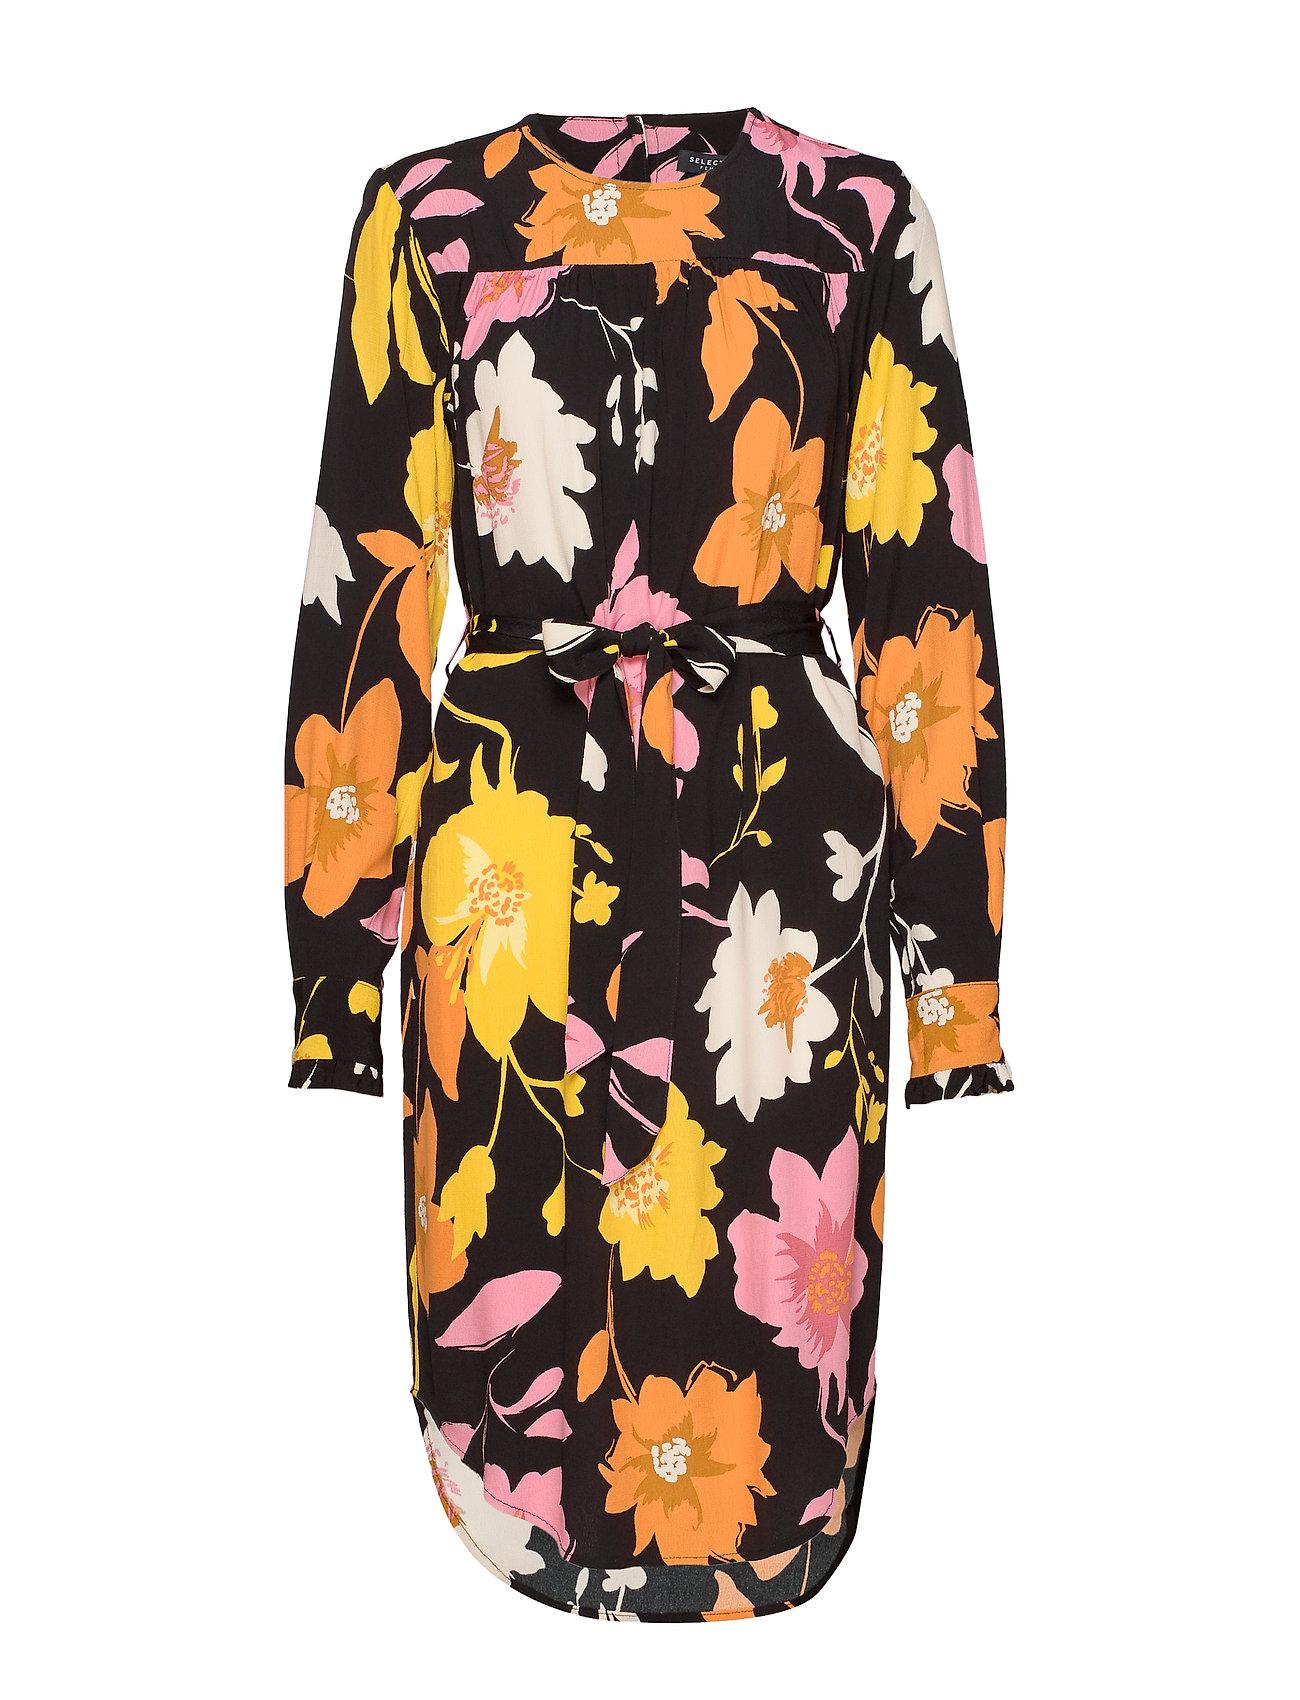 Selected Femme SLFCADENCE-DYNELLA LS SHORT AOP  DRESS B - BLACK